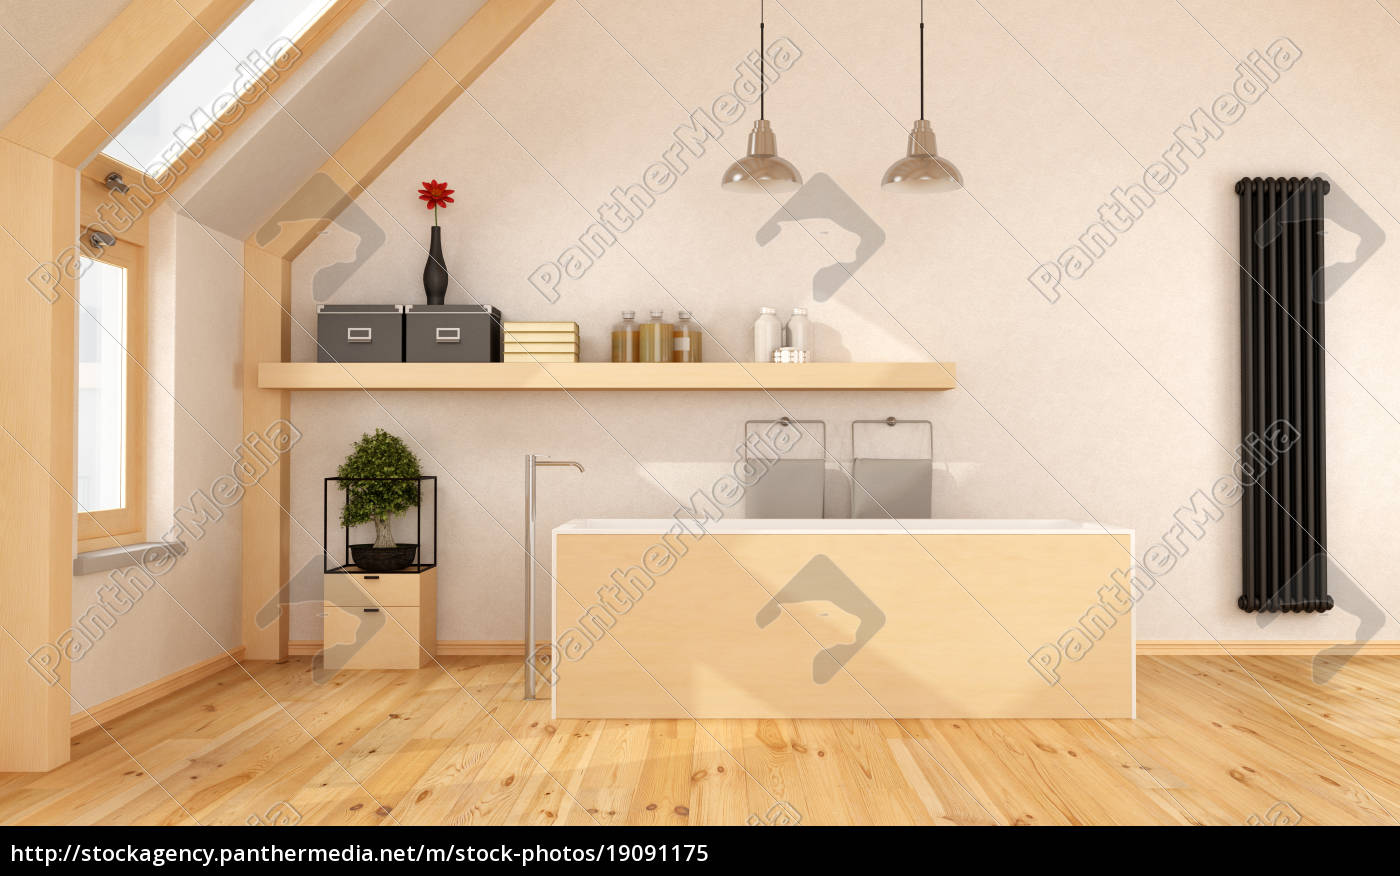 holz bad im dachgeschoss stockfoto 19091175. Black Bedroom Furniture Sets. Home Design Ideas